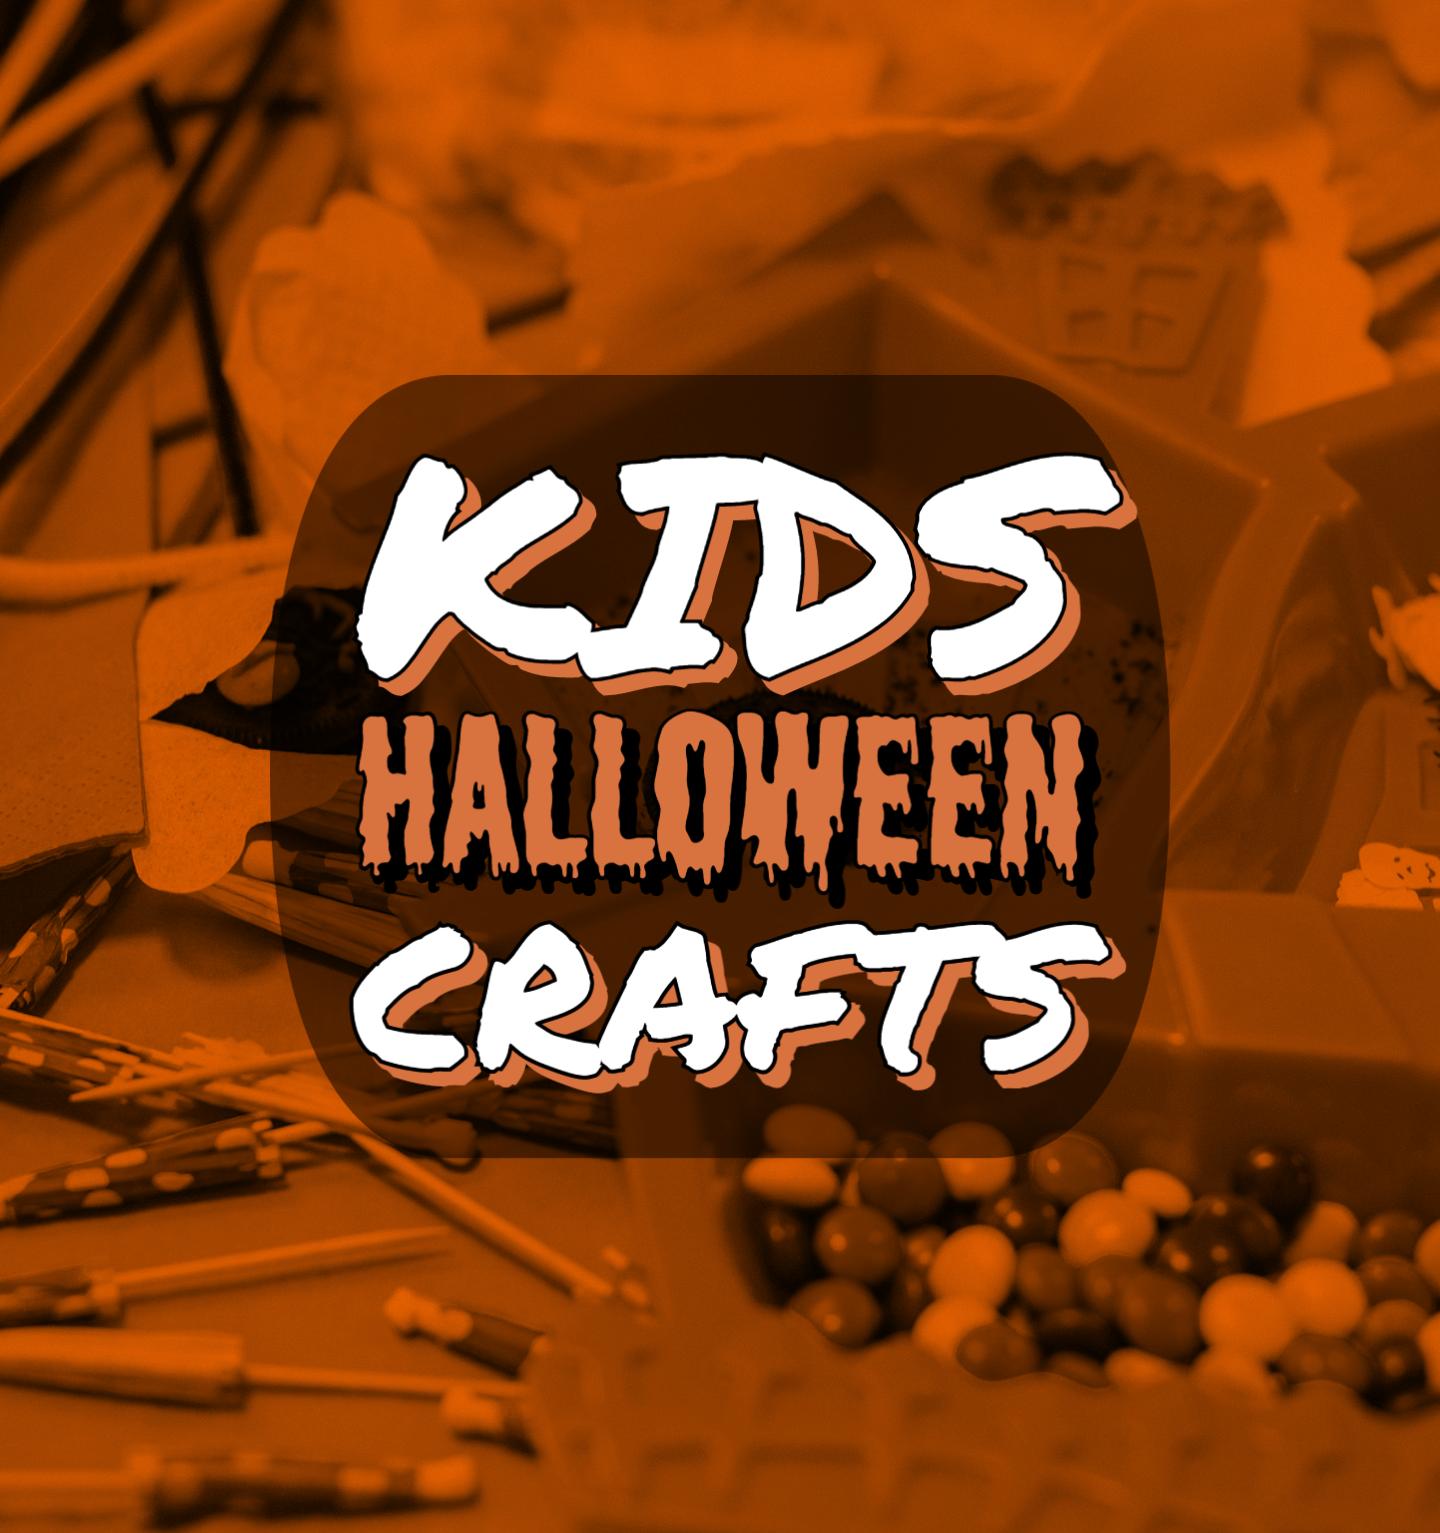 Kids Halloween Crafts Text With Supplies Photos